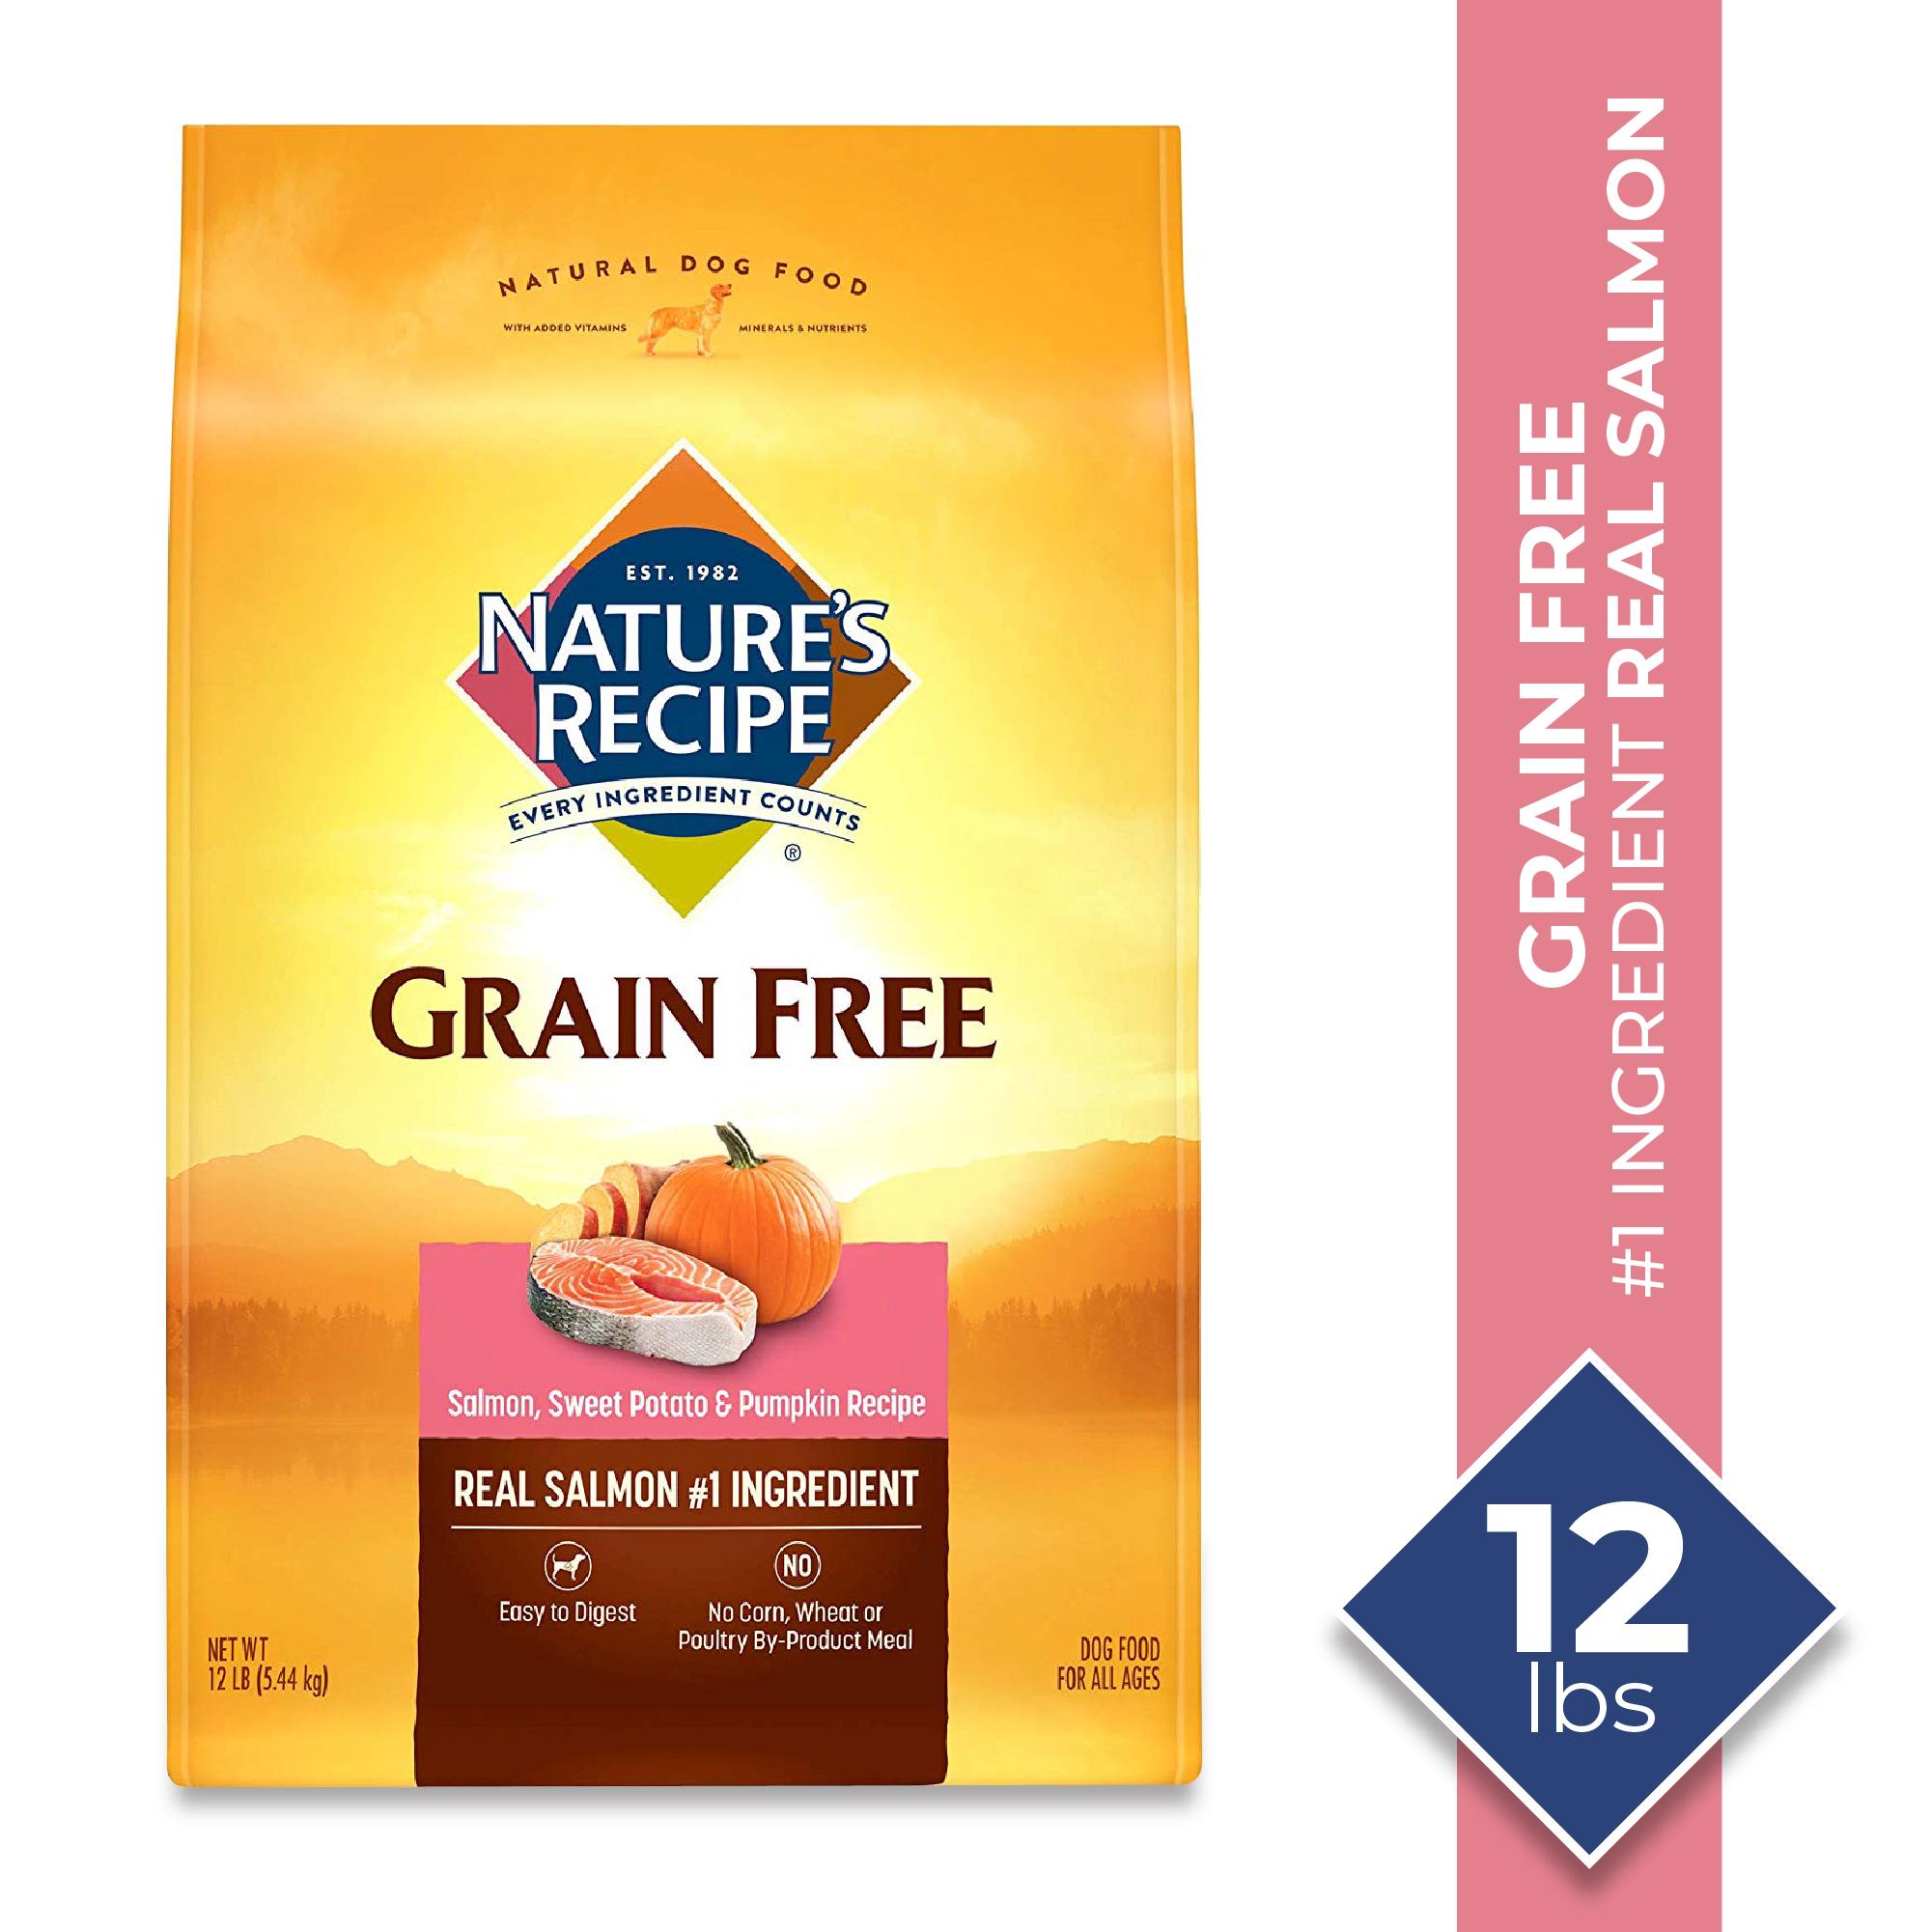 Nature's Recipe Grain Free Salmon, Sweet Potato & Pumpkin